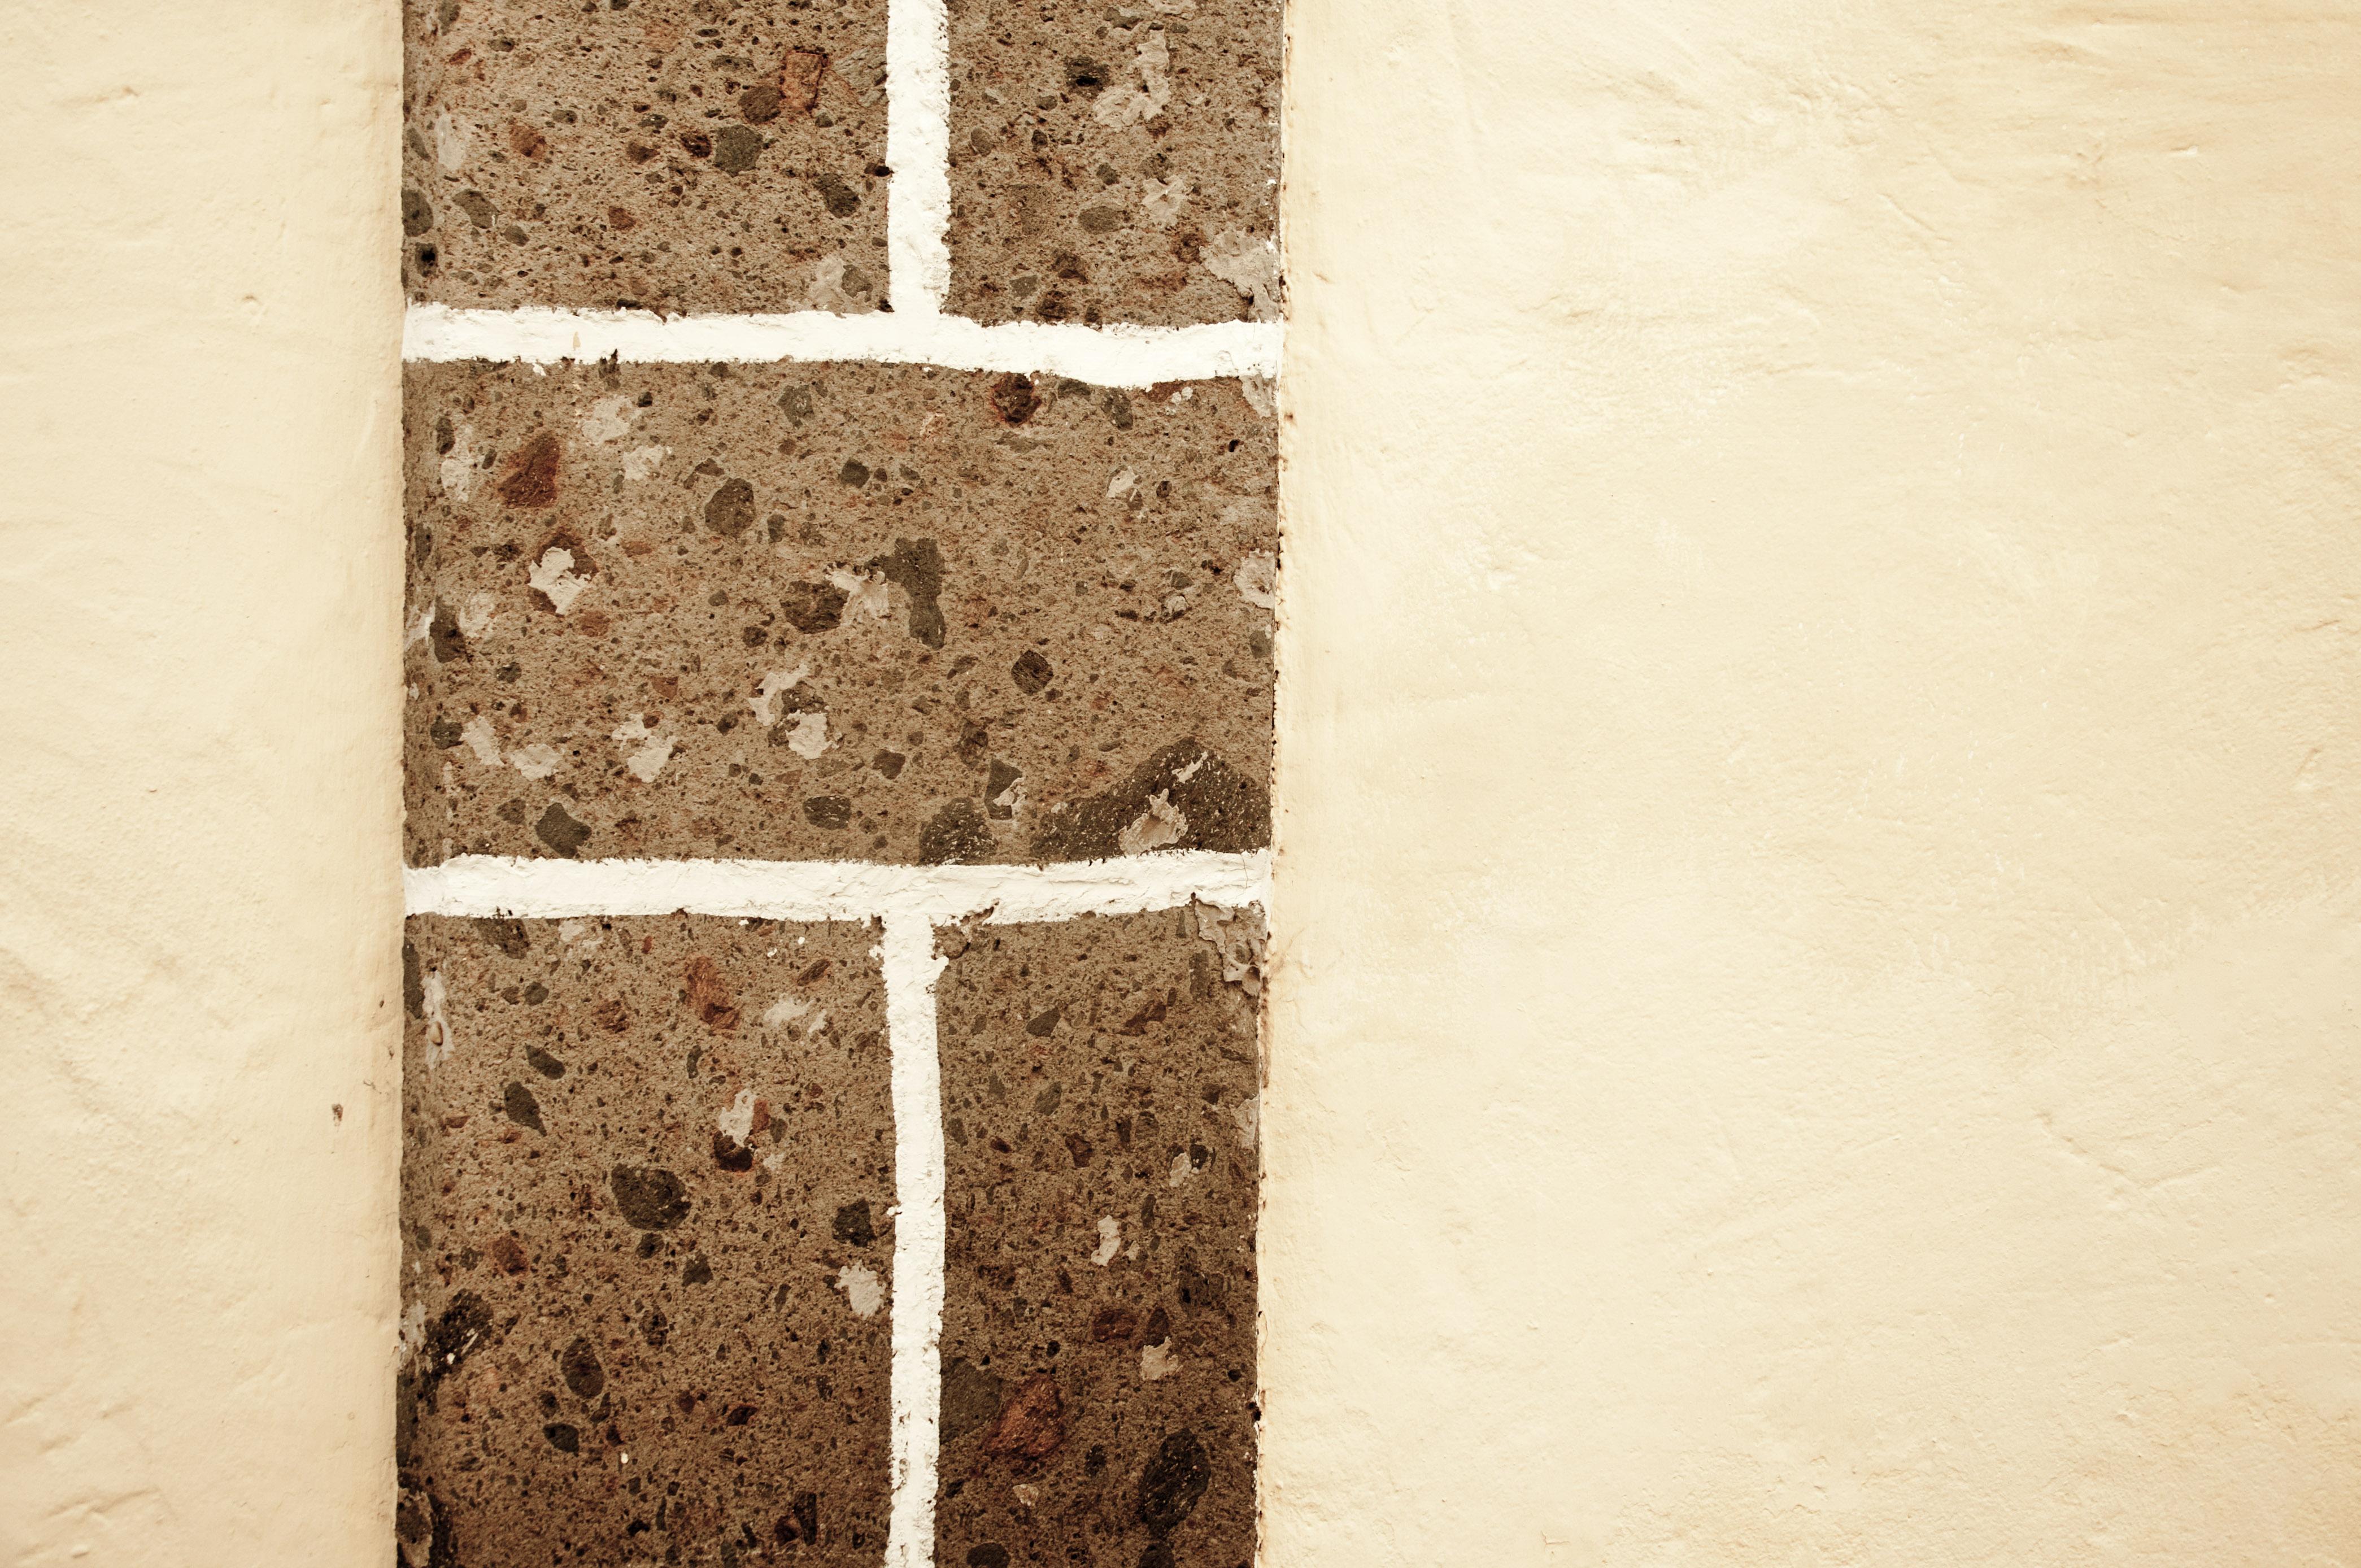 Brick wall texture photo